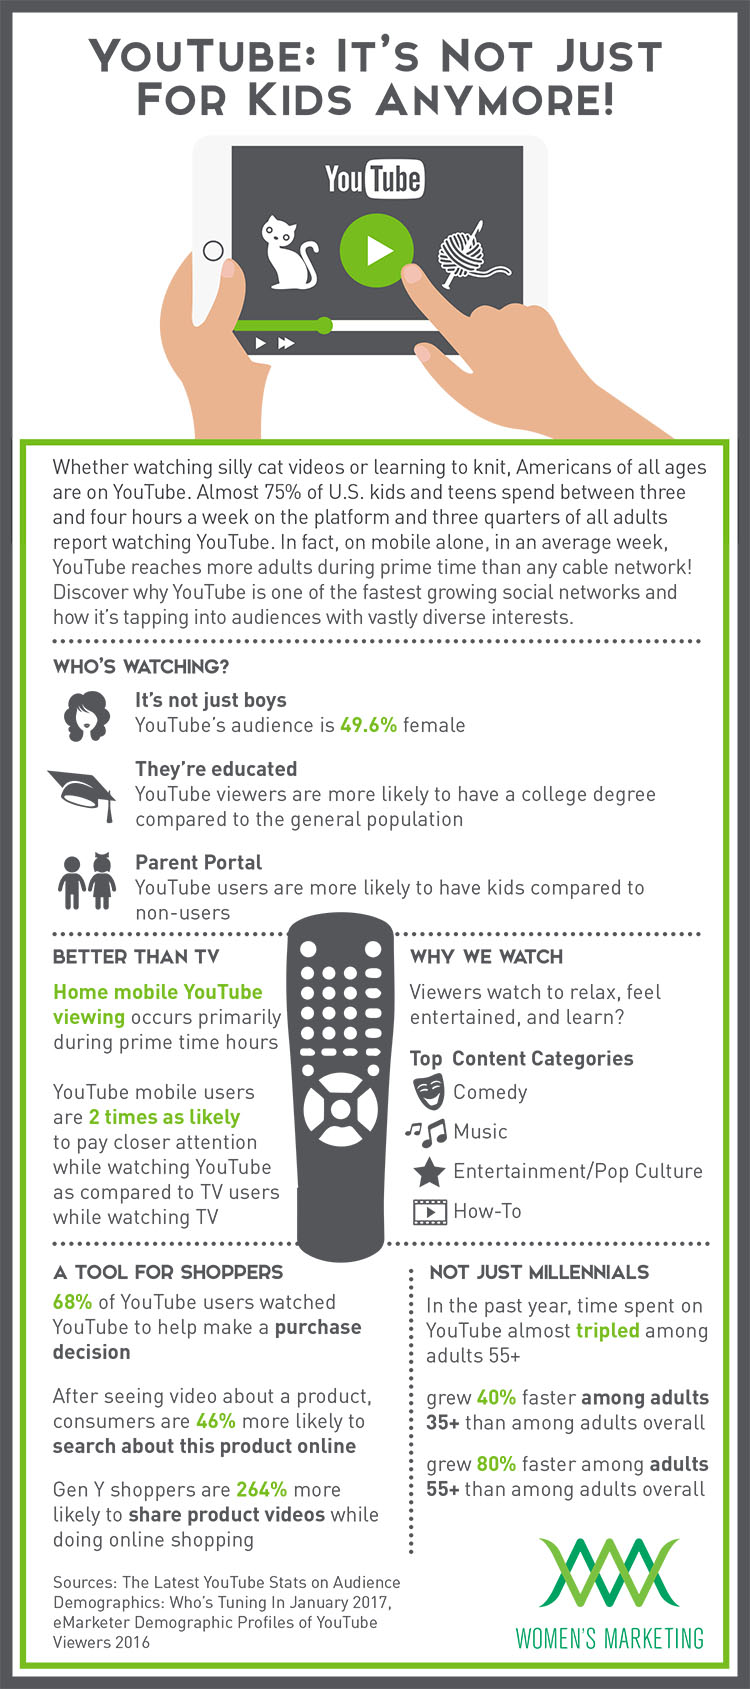 YouTube_NotForKidsAnymore_Infographic.jpg